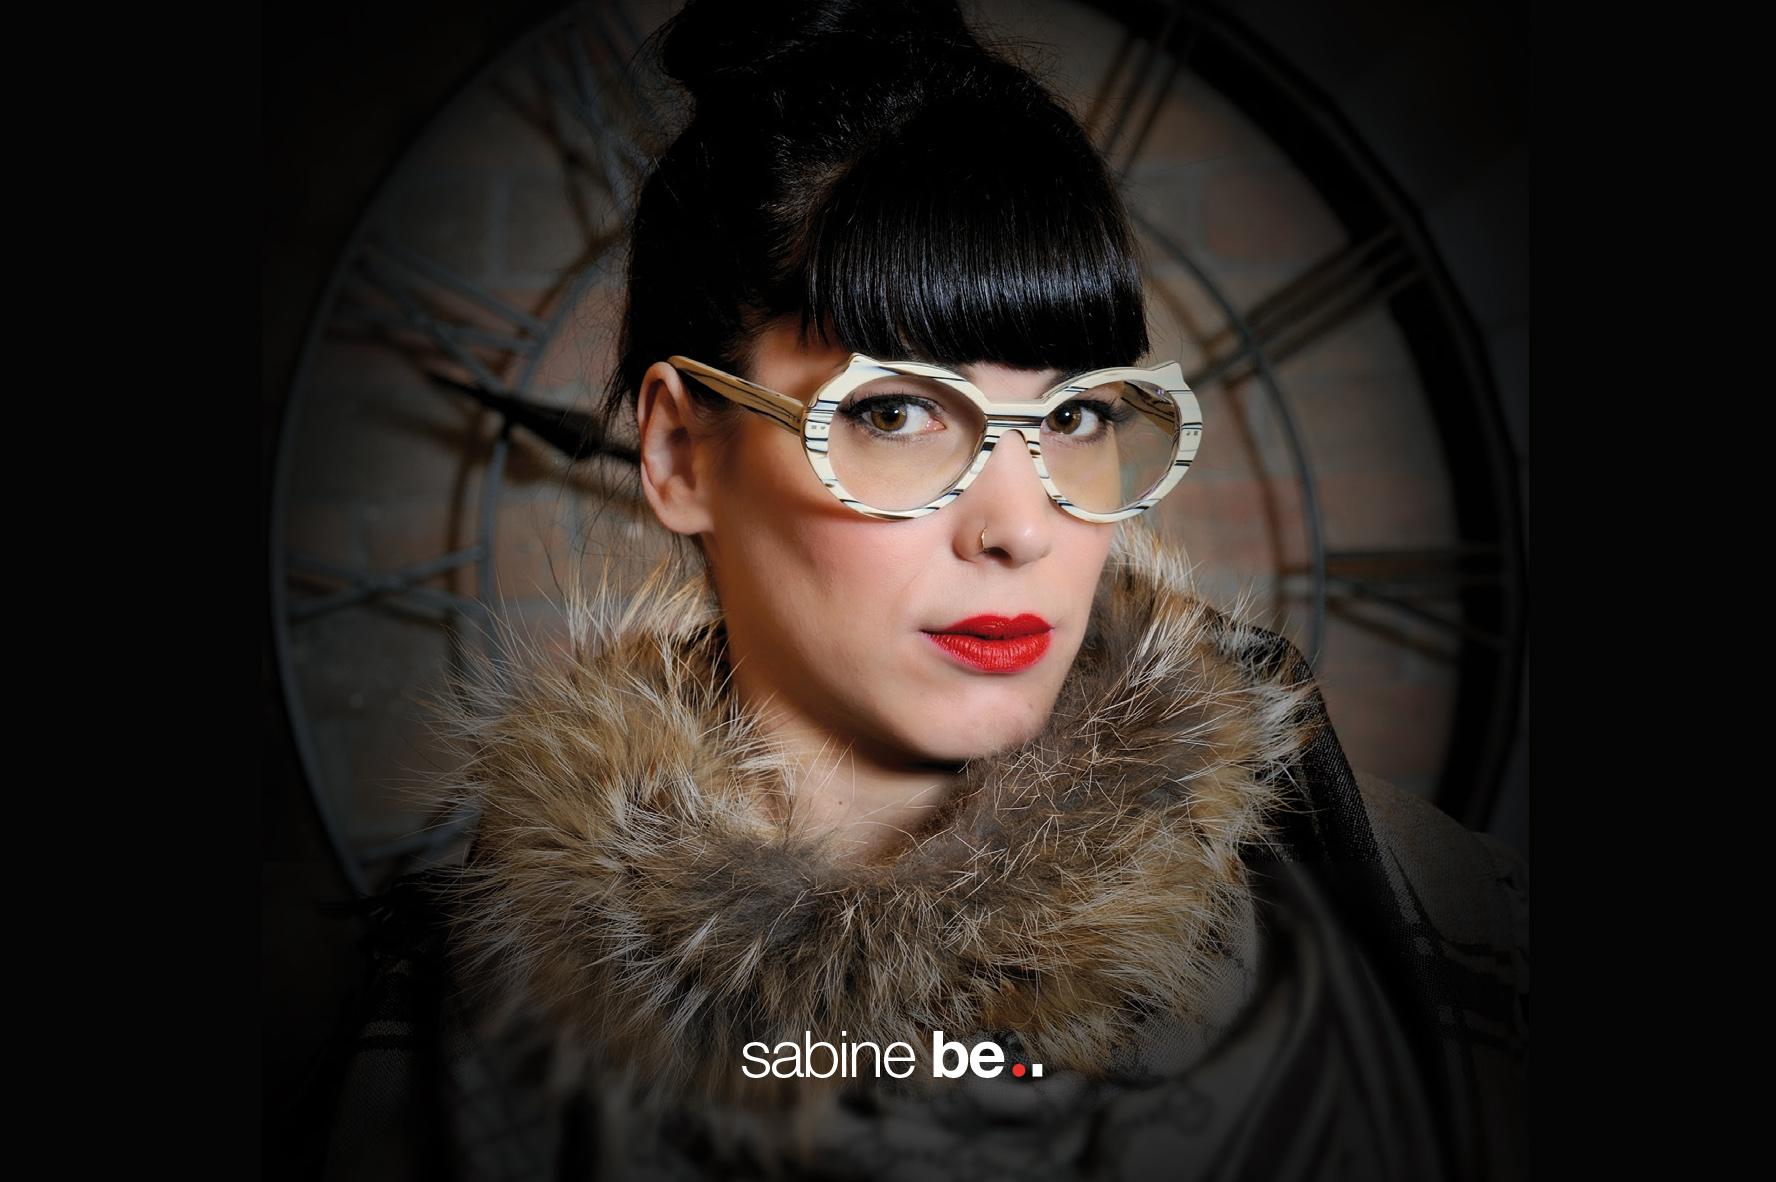 Sabine-309-18-14-56-52